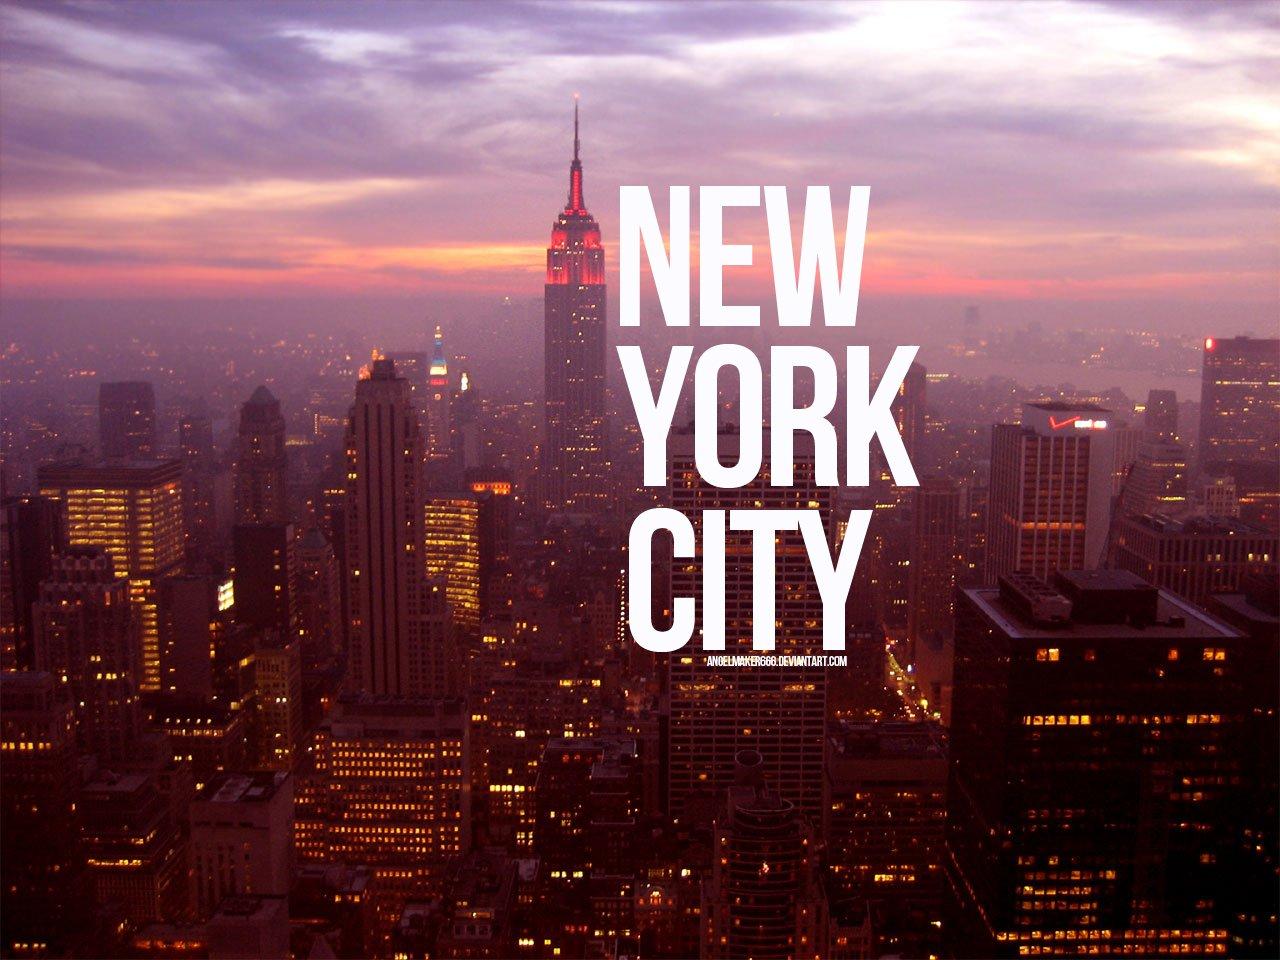 new york city wallpaper by ishaanmishra customization wallpaper hdtv 1280x960